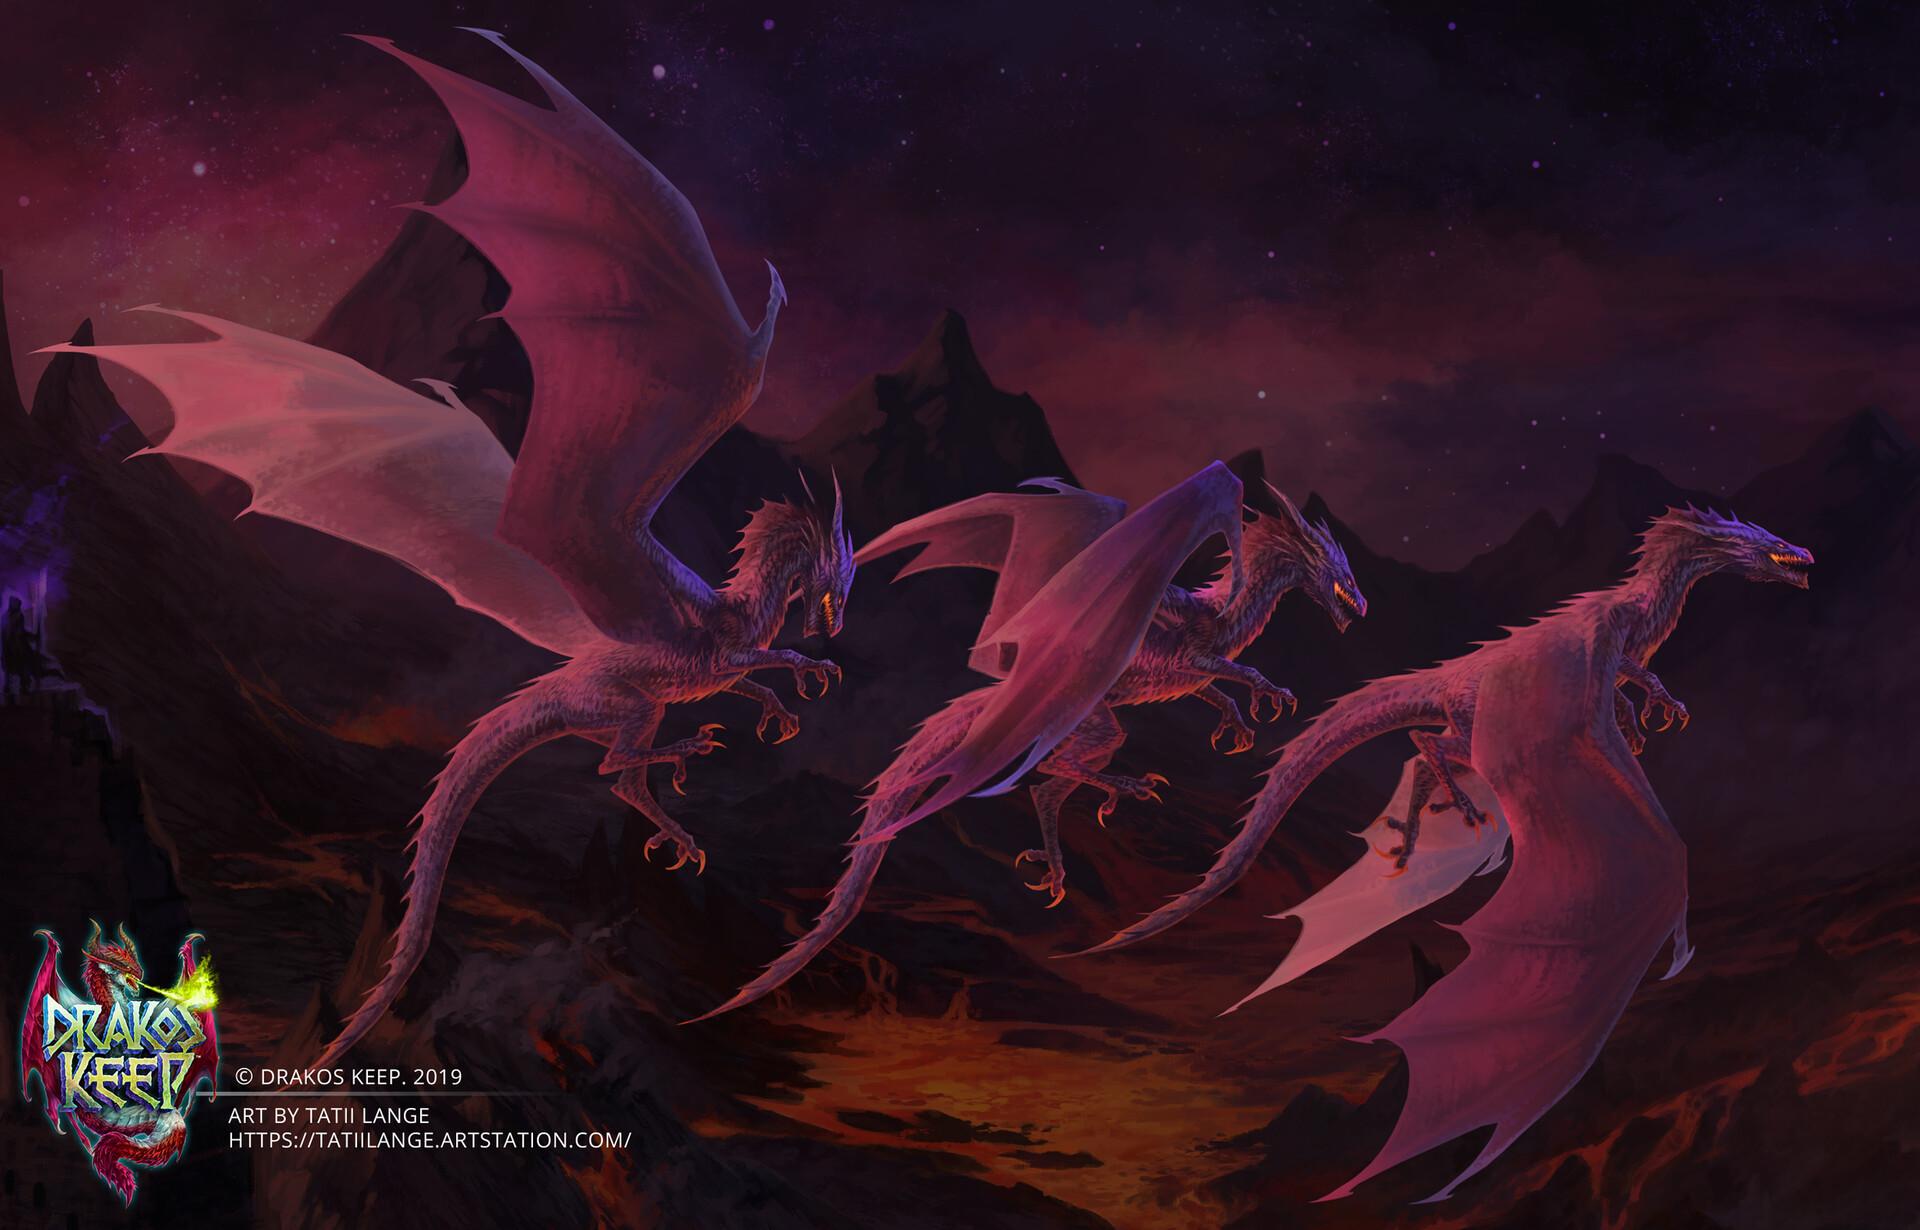 Tatii lange website splash art dragon